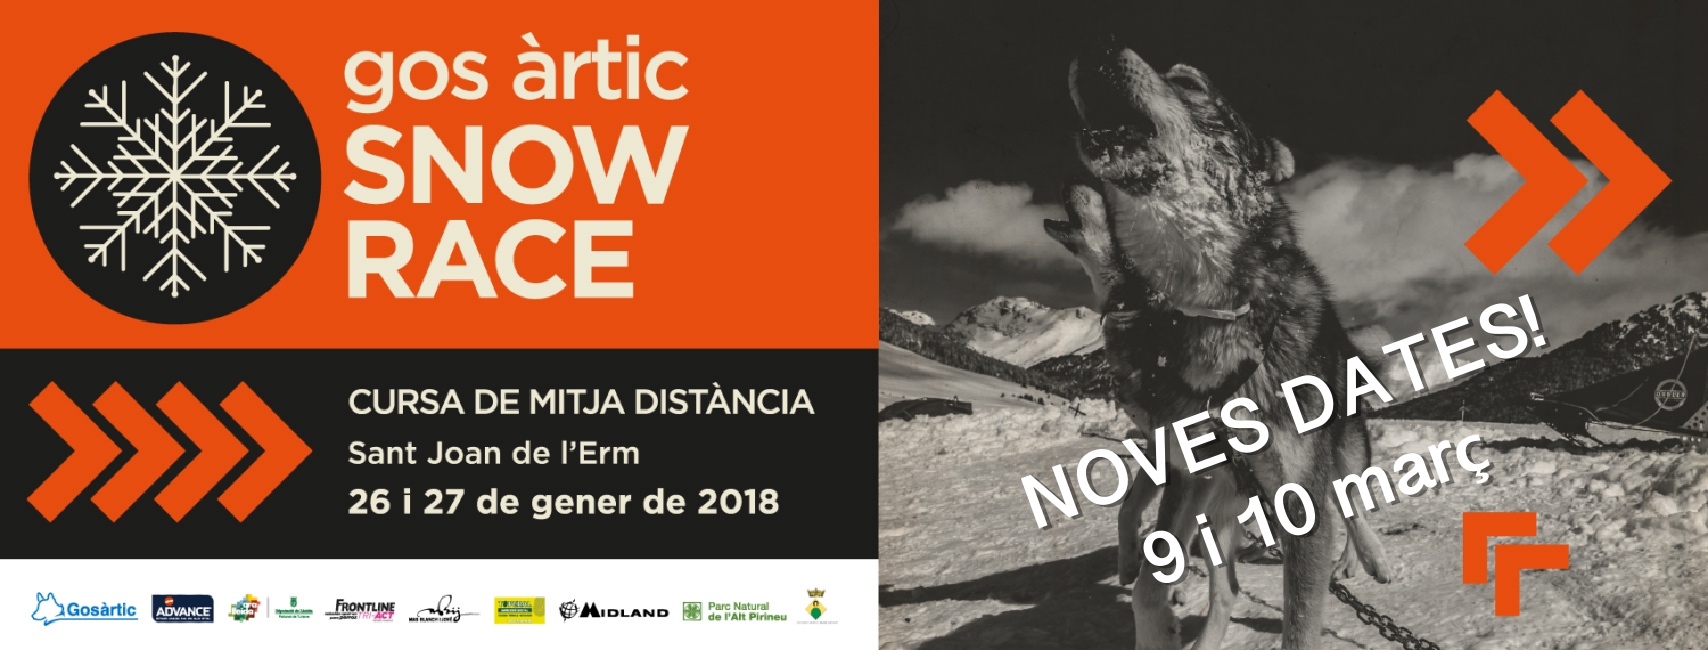 snowrace-fb-noves-dates